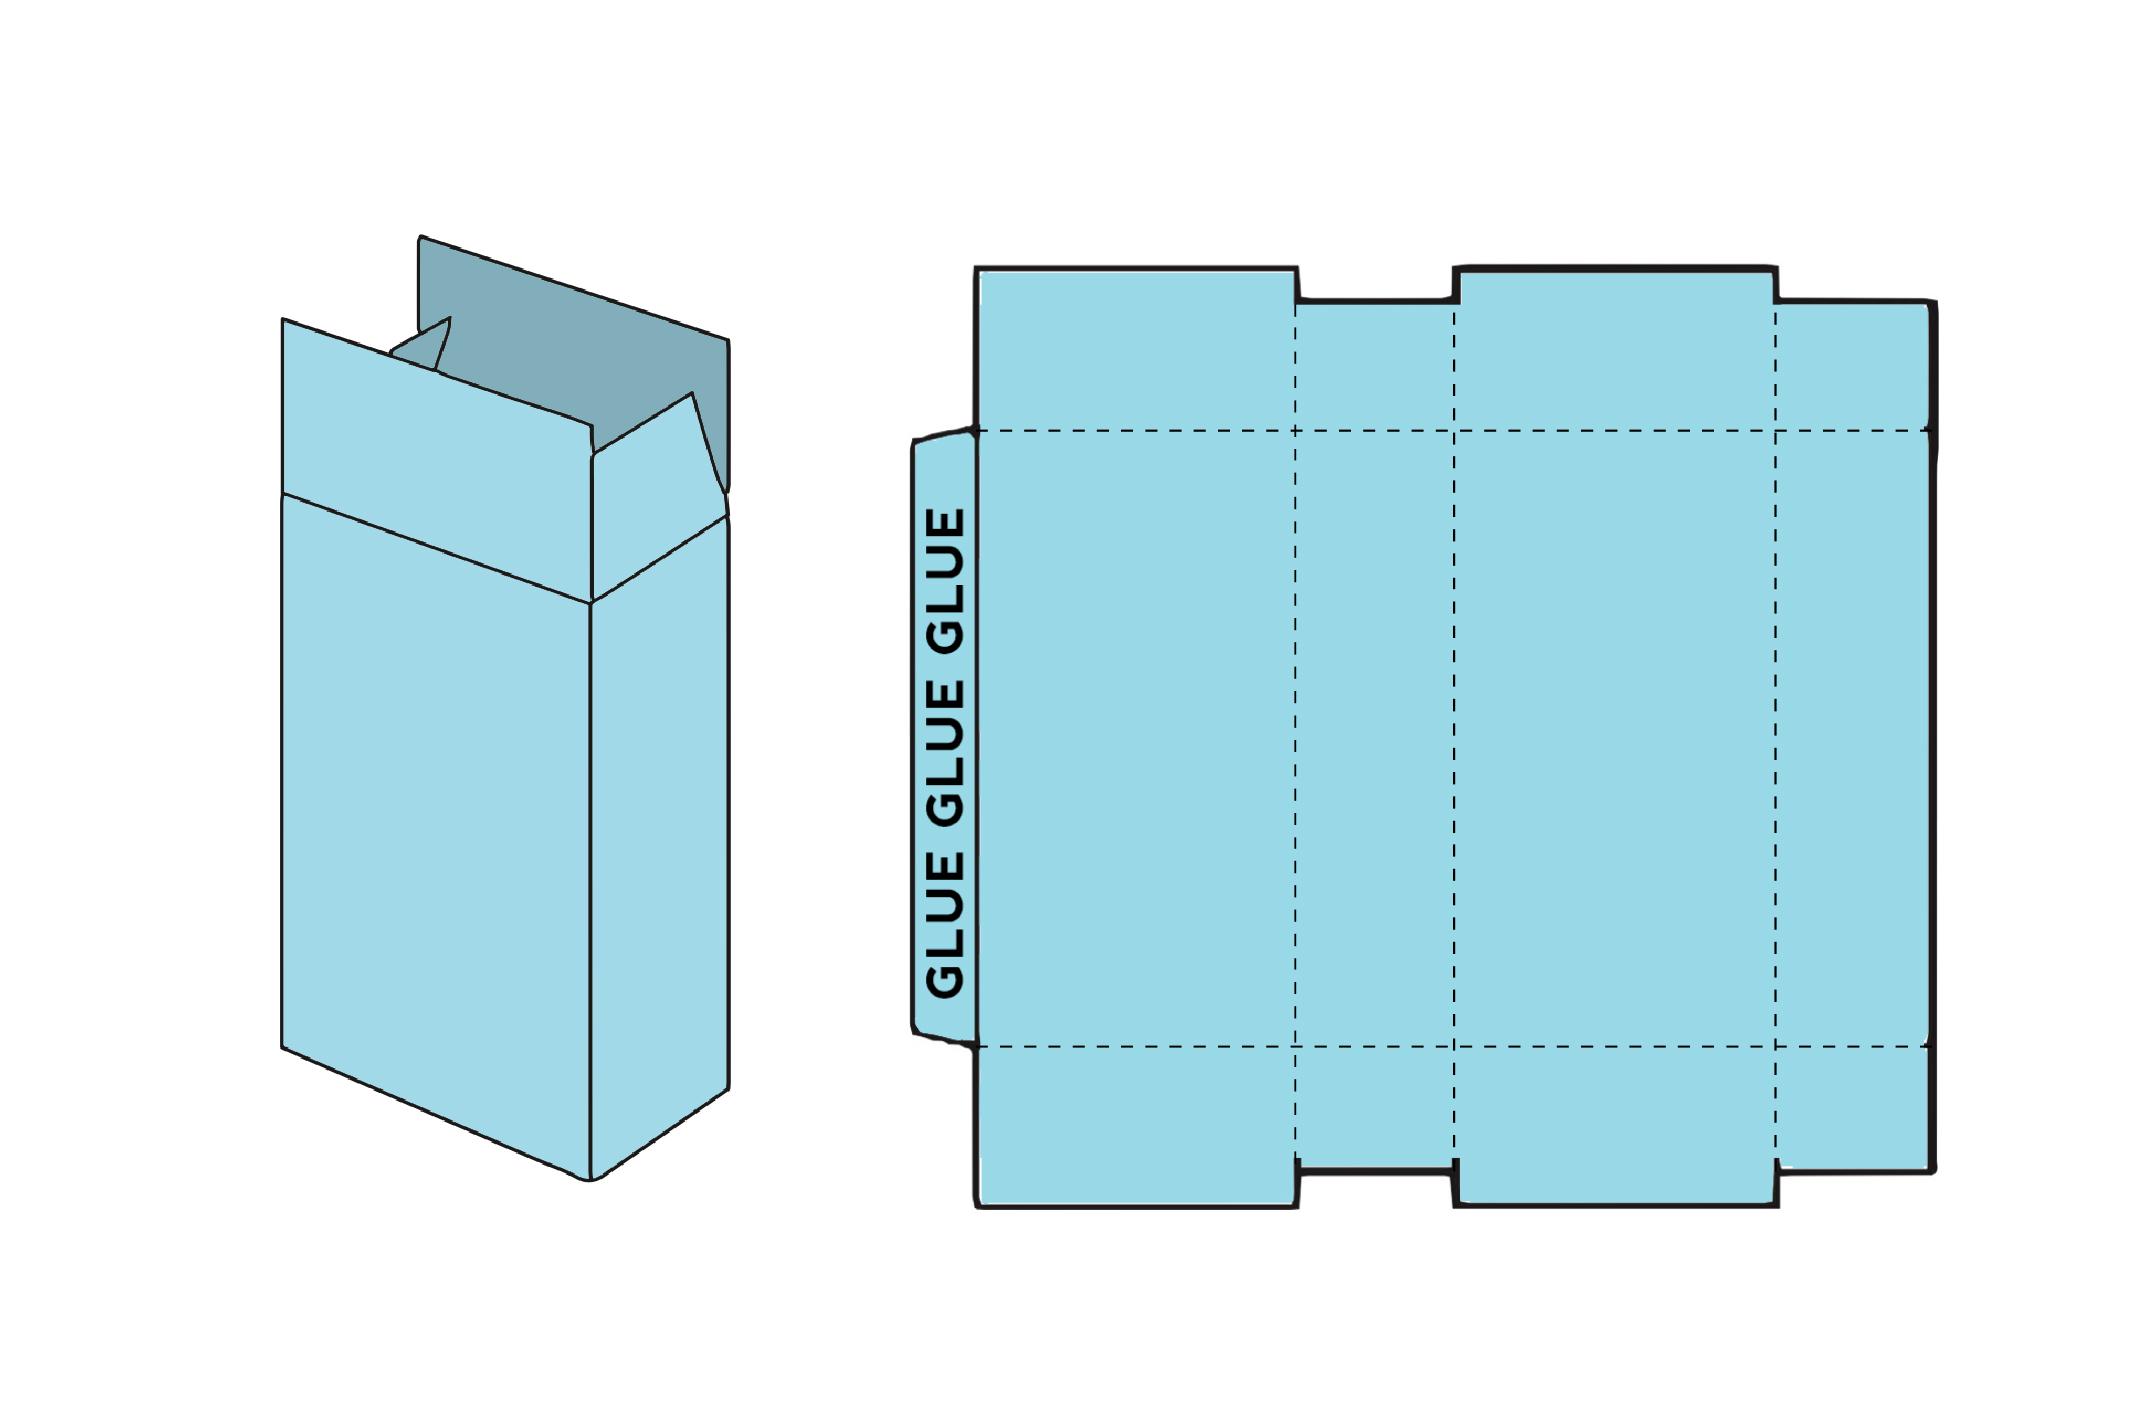 Box Geometries